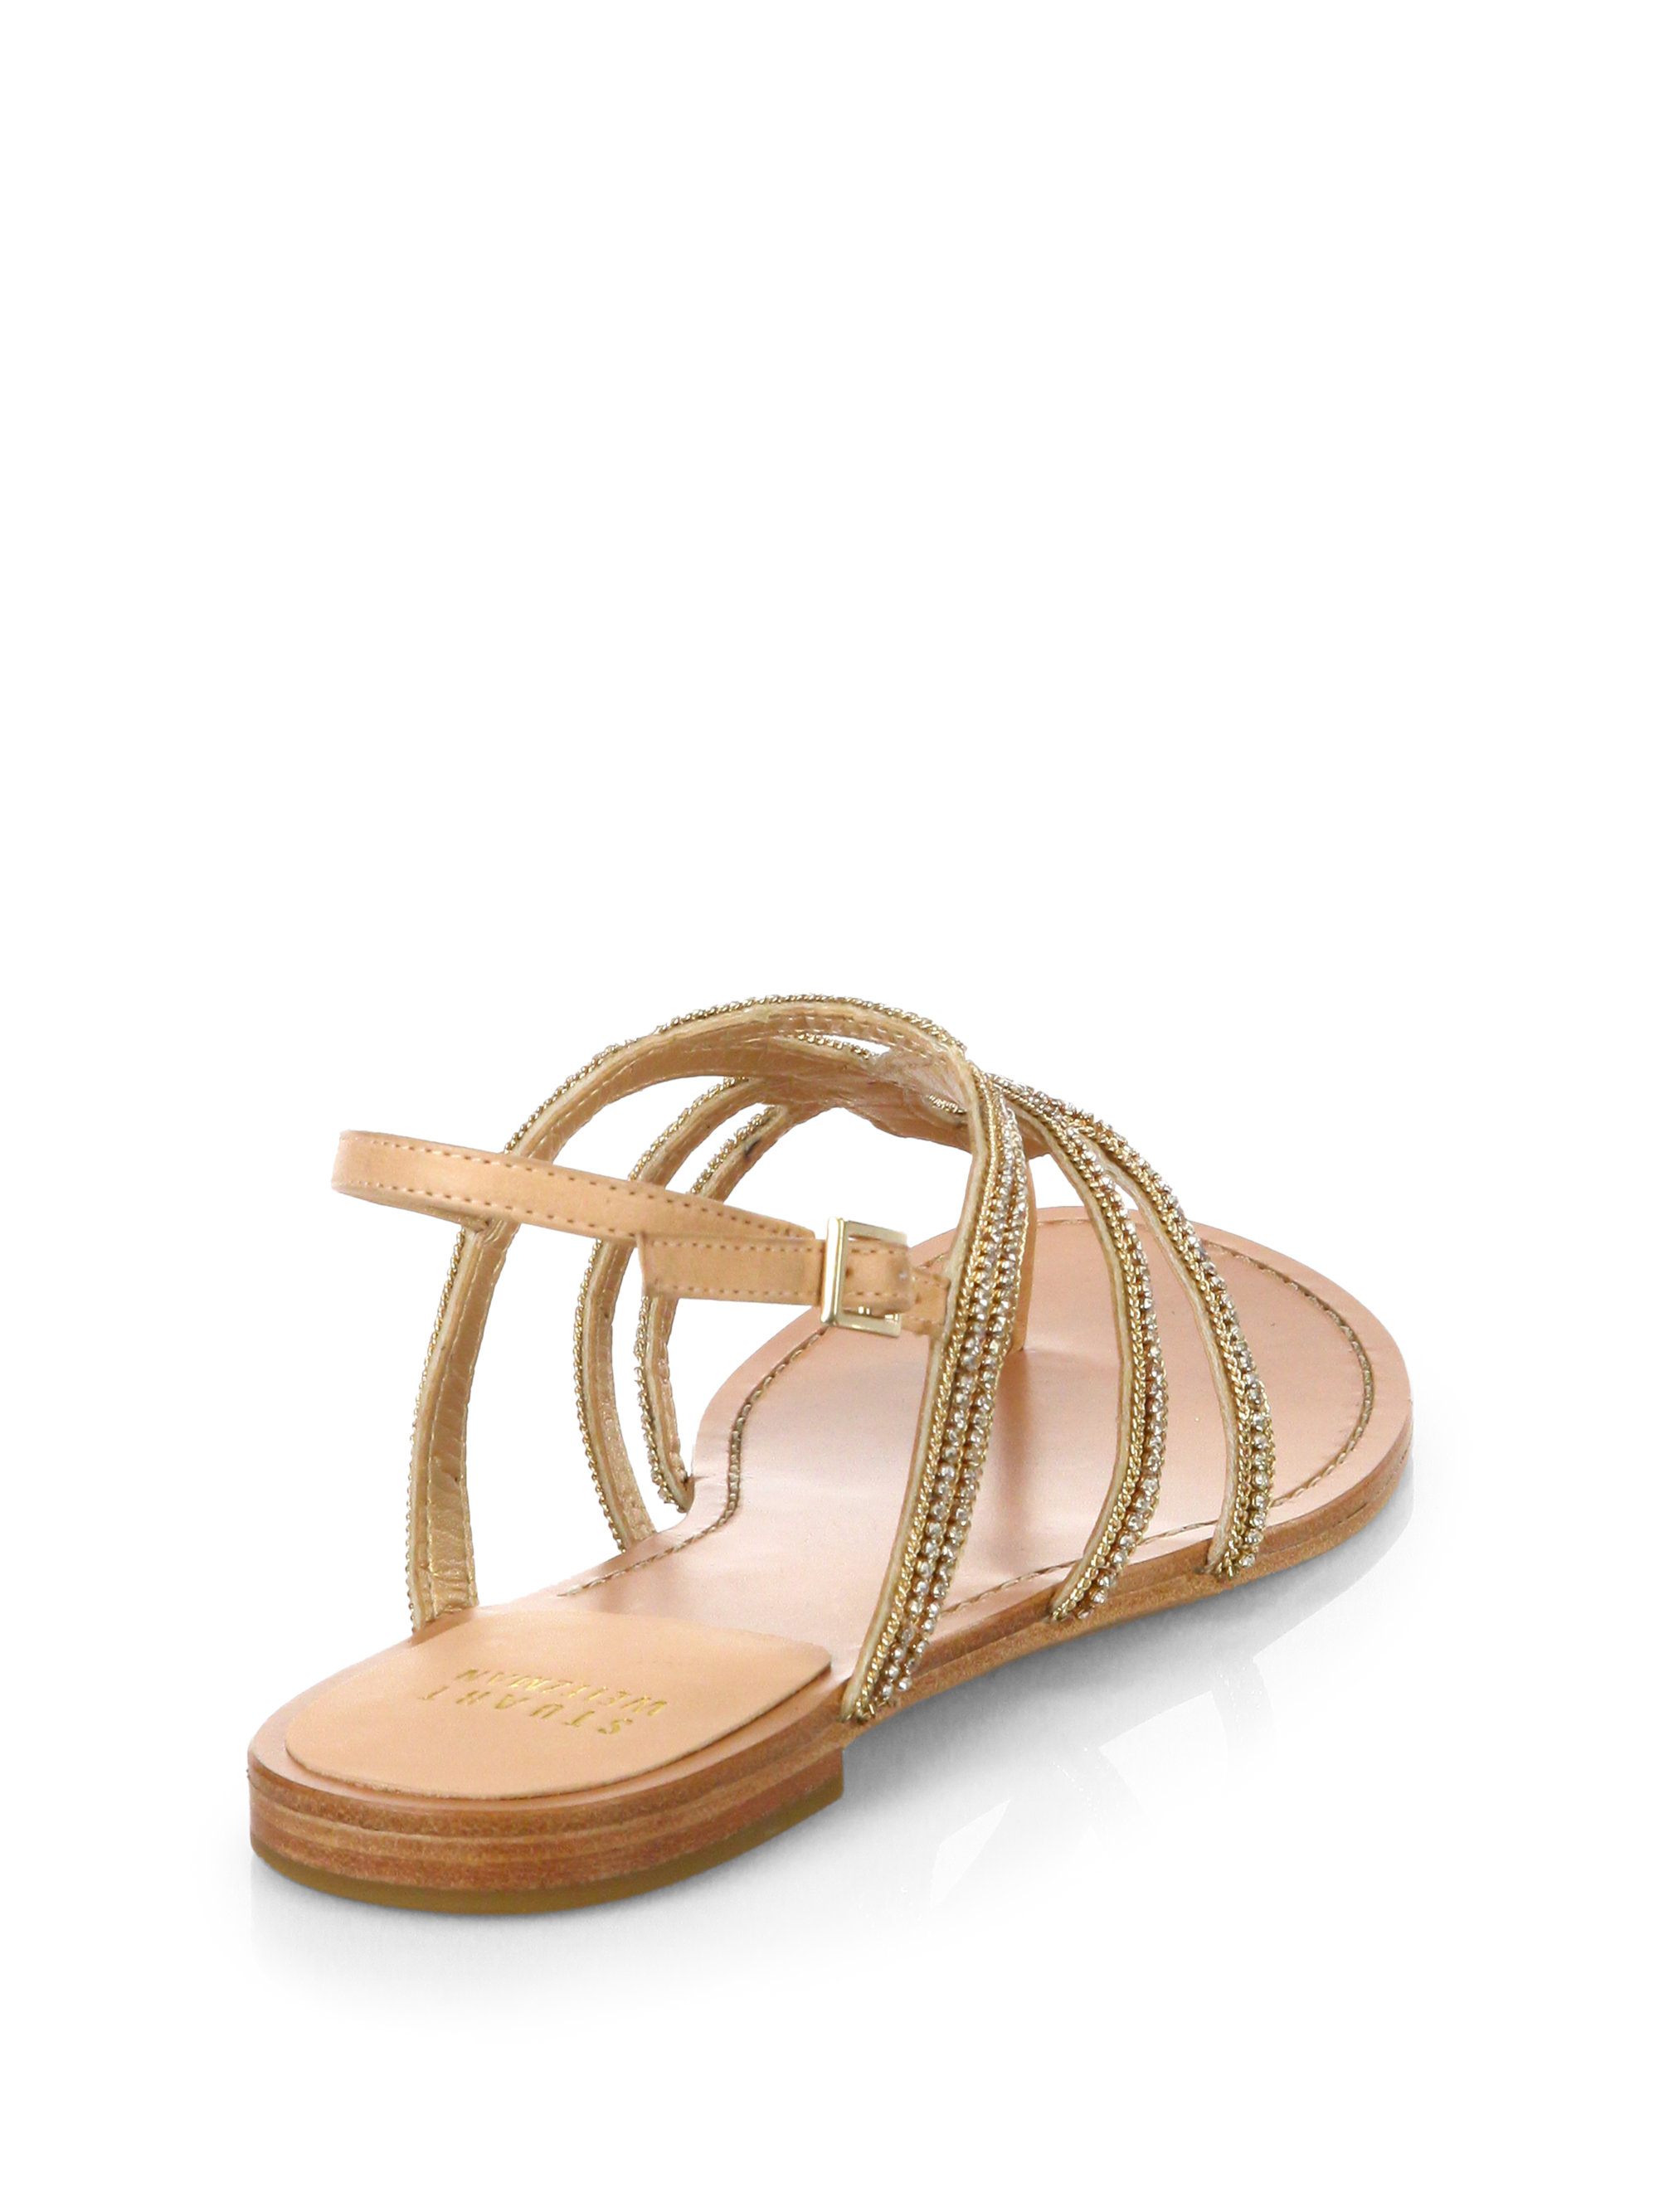 Stuart Weitzman Crystal-Embellished Metallic Sandals clearance store for sale k8nDU